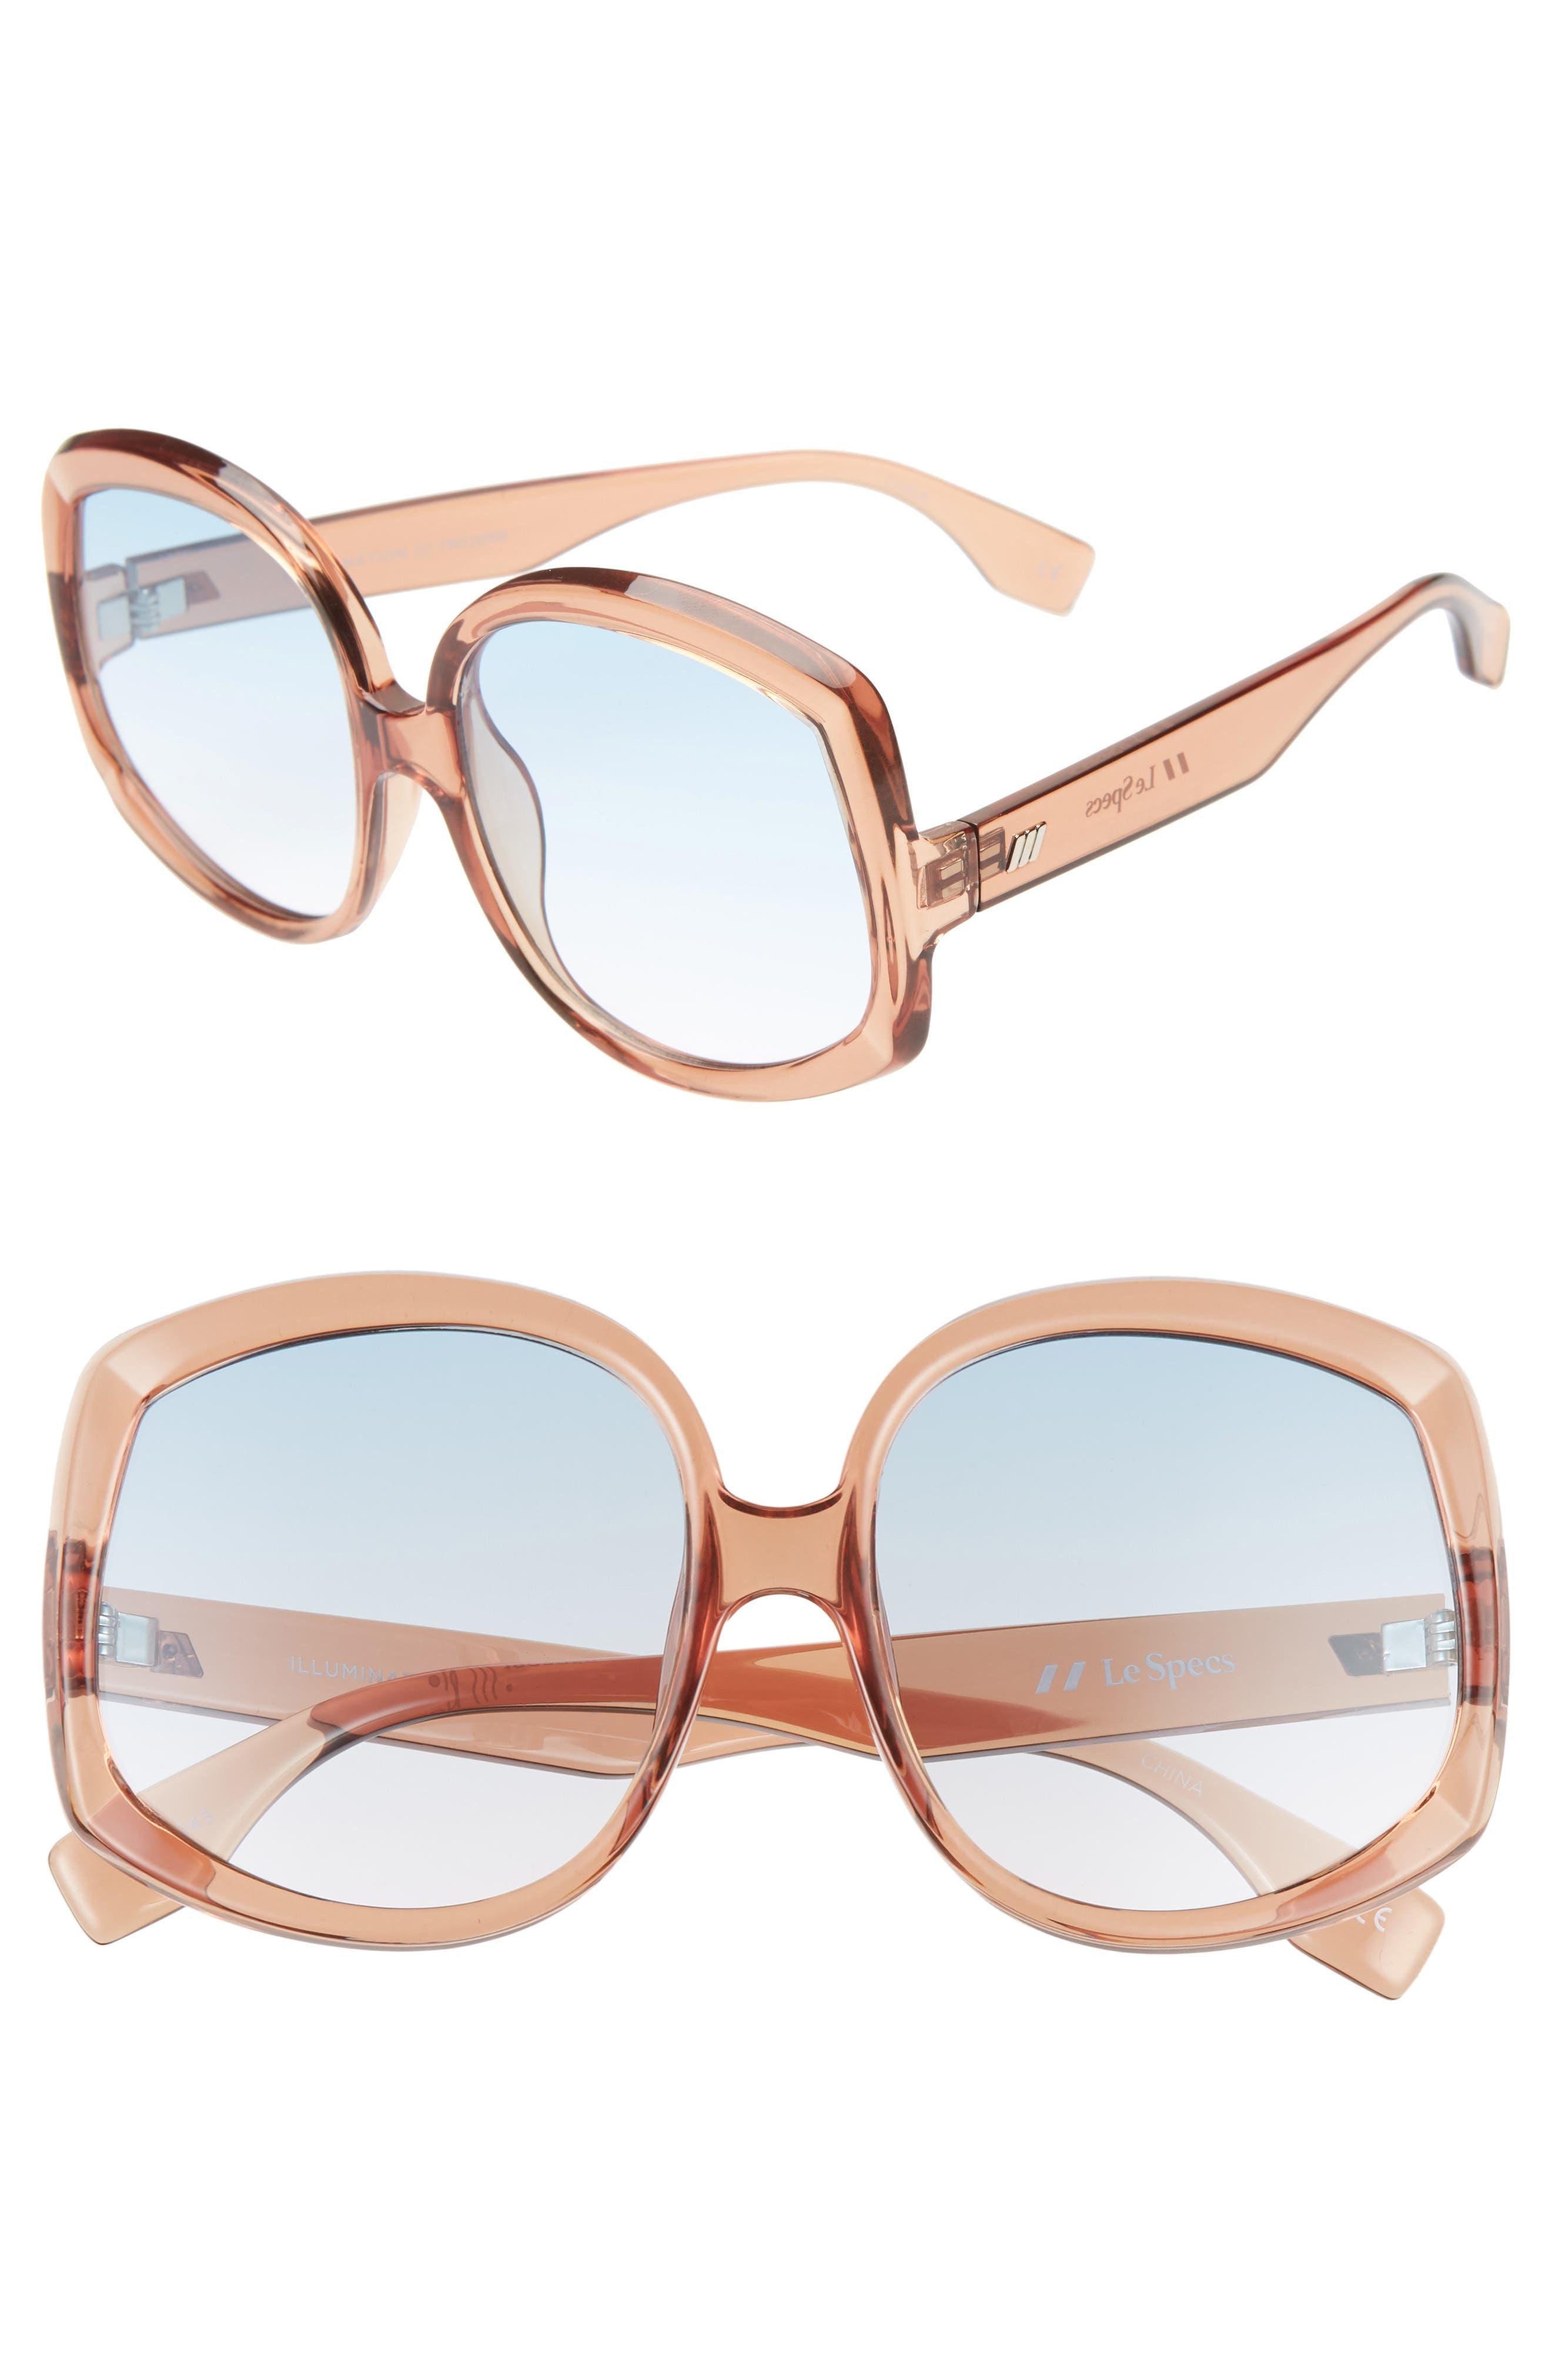 Le Specs Illumination 5m Square Sunglasses - Syrup/ Teal Gradient